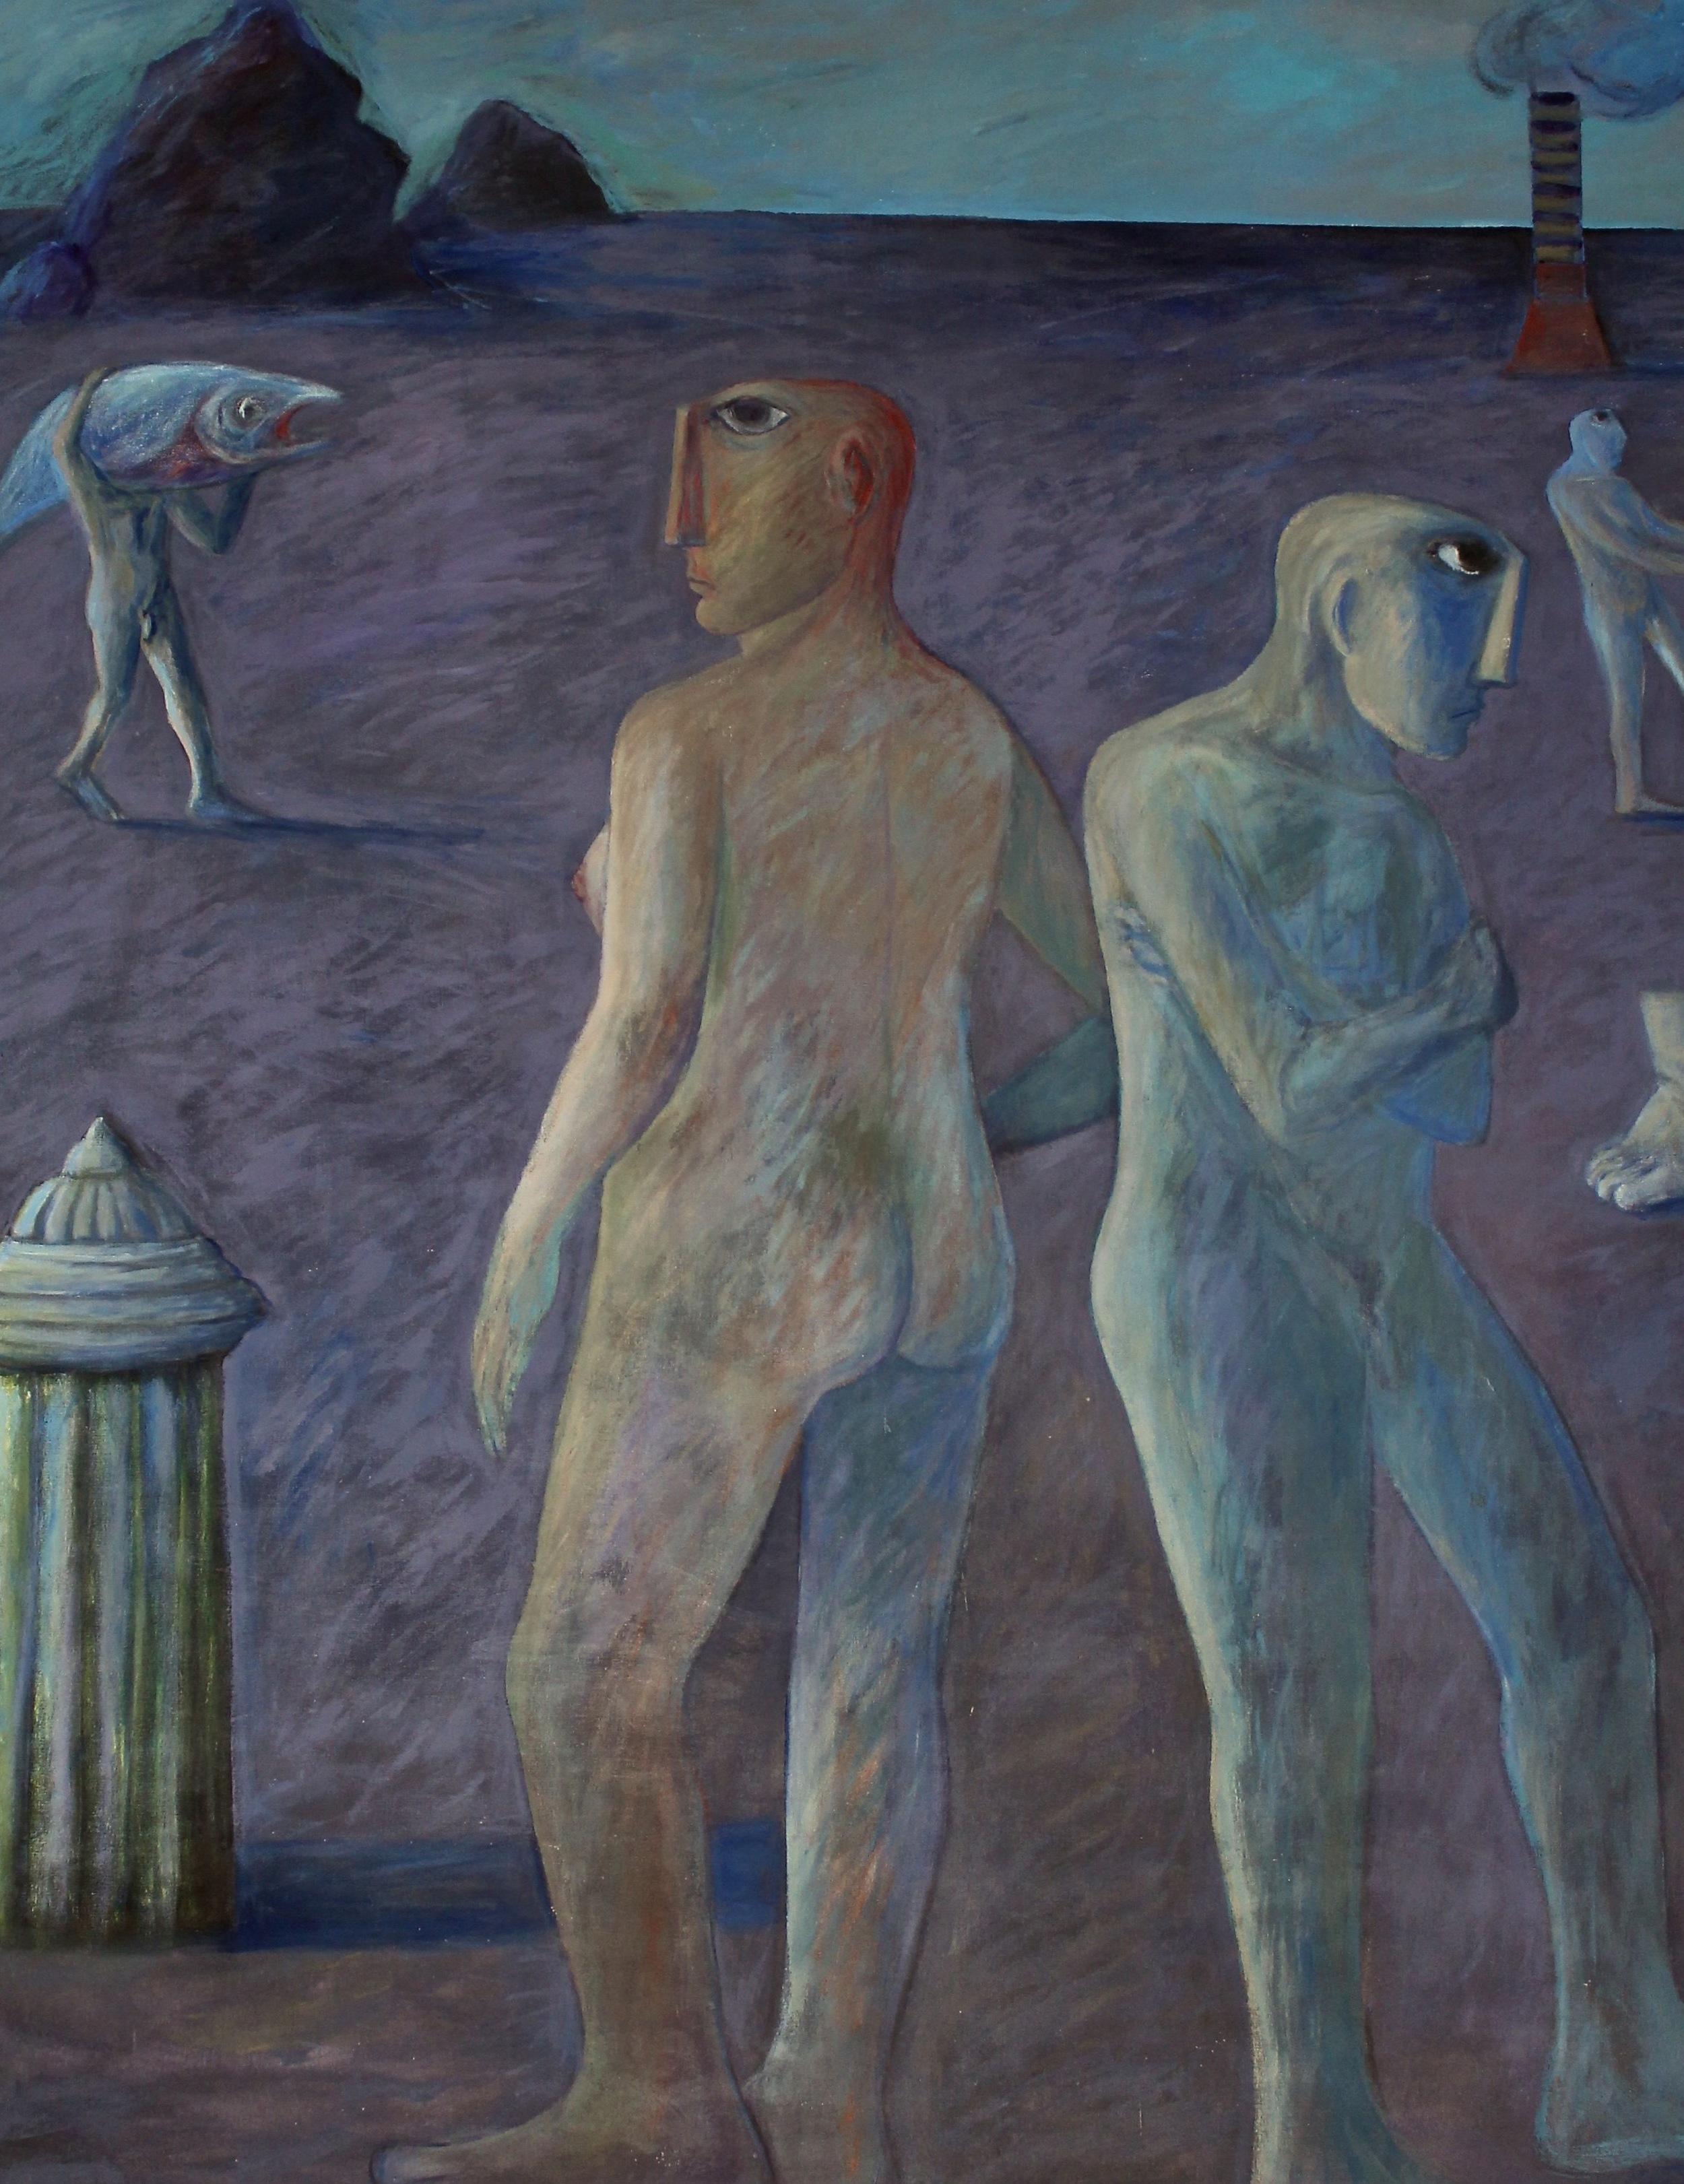 Ahmed Morsi, Seaside,1995,(diptych, detail)Acrylic on canvas,235 x 360 cm.